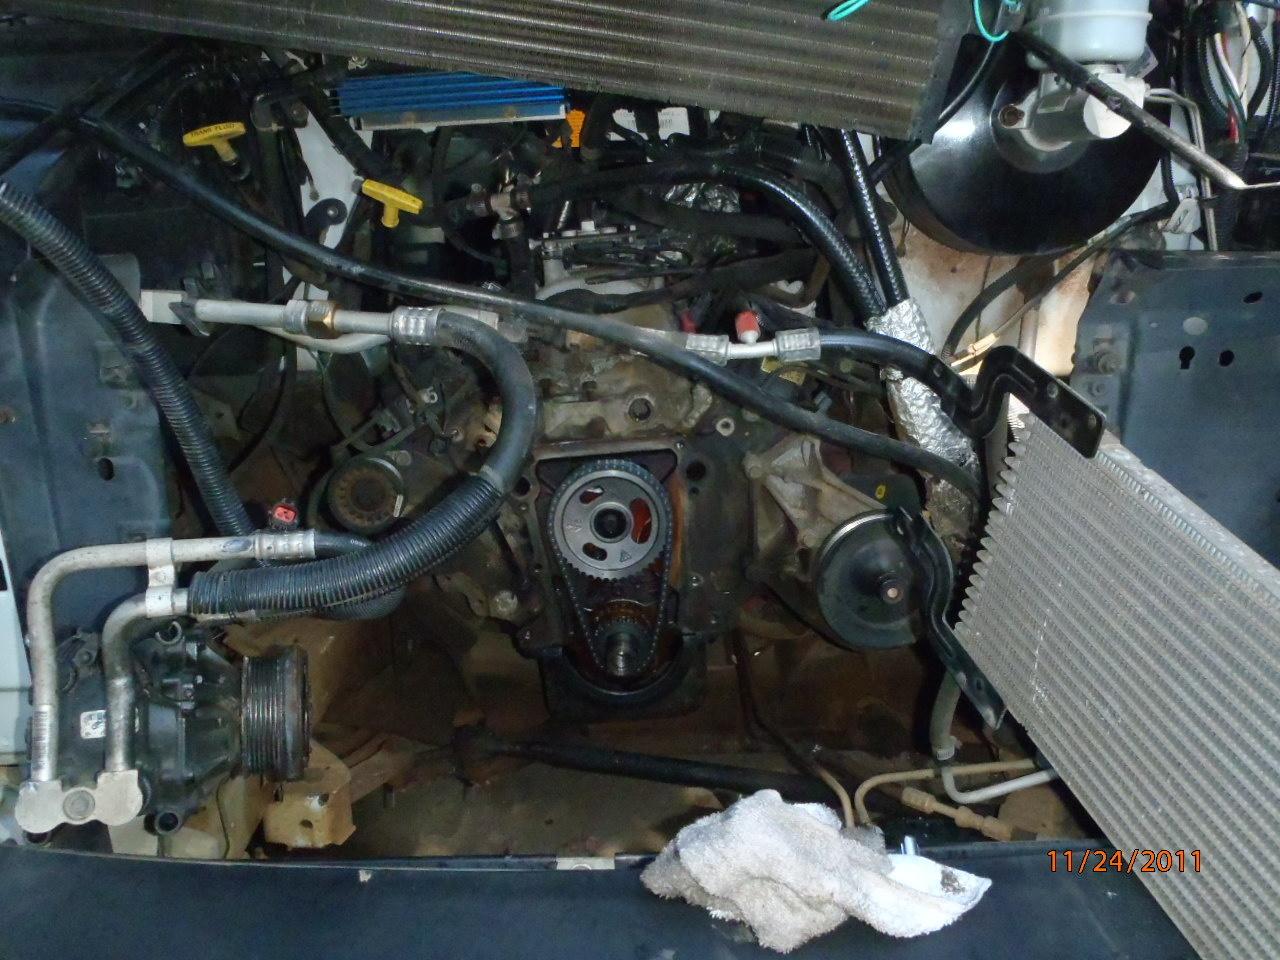 hight resolution of how to repair a 1992 dodge ram 250 van water pump 318 motor